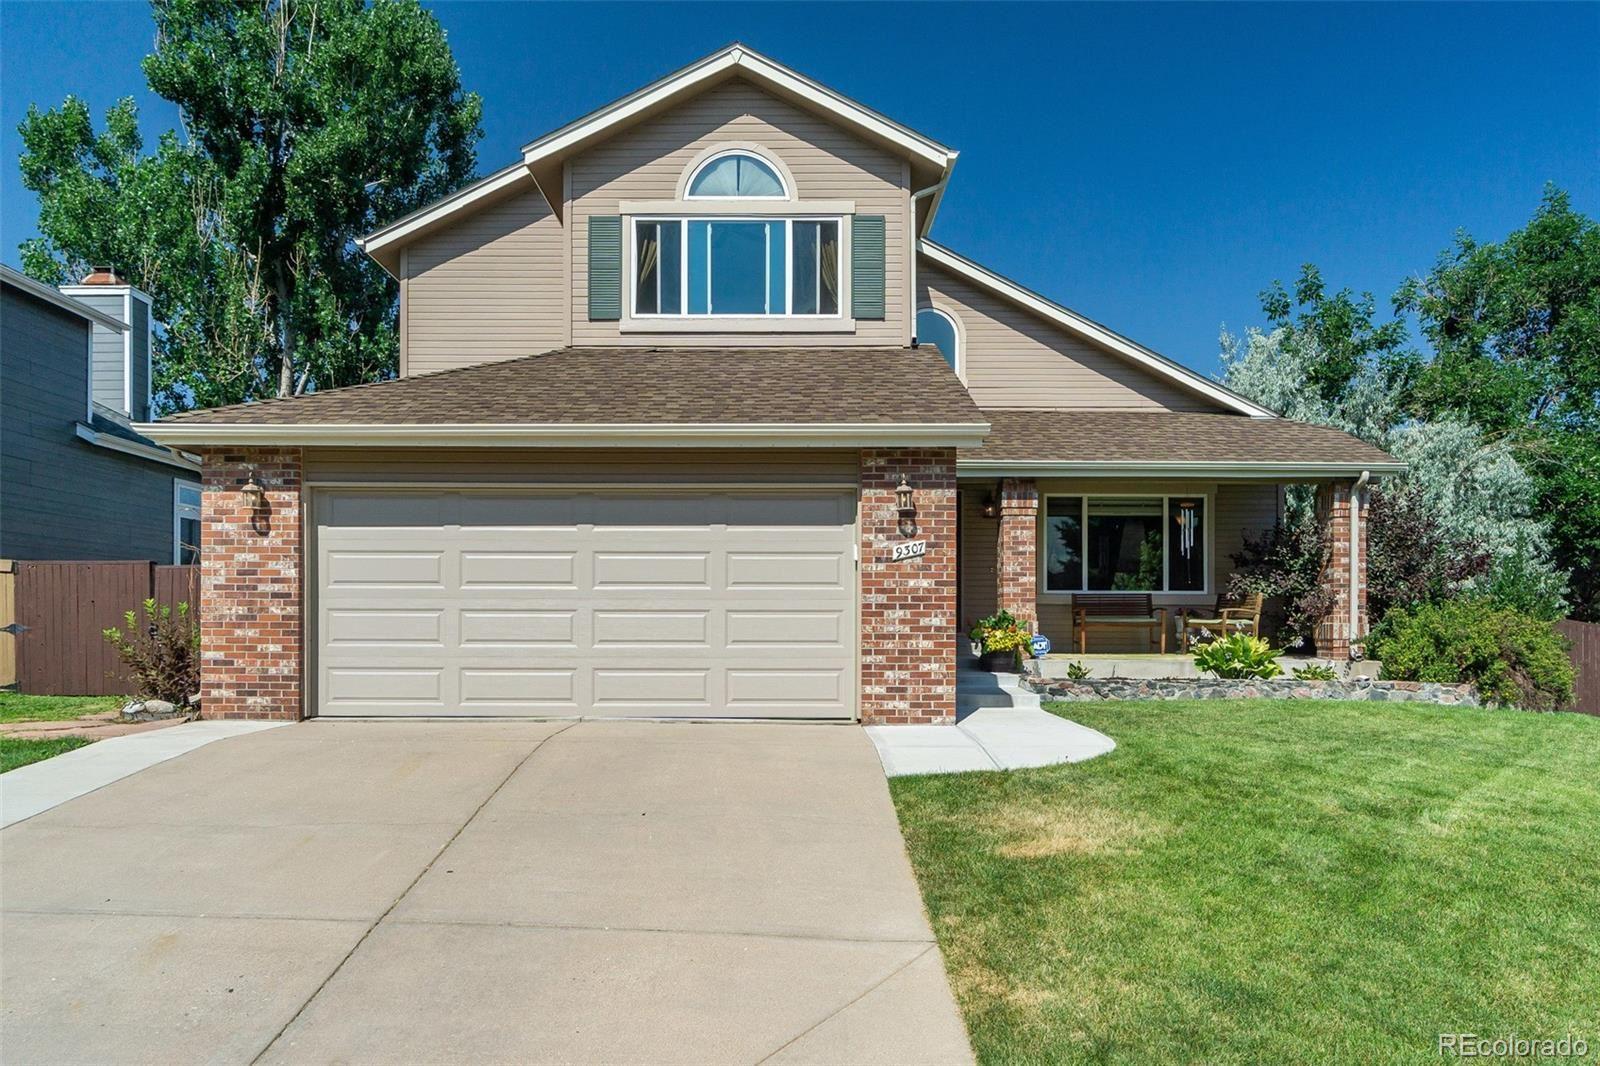 9307 Shadowglen Court, Highlands Ranch, CO 80126 - MLS#: 5637962